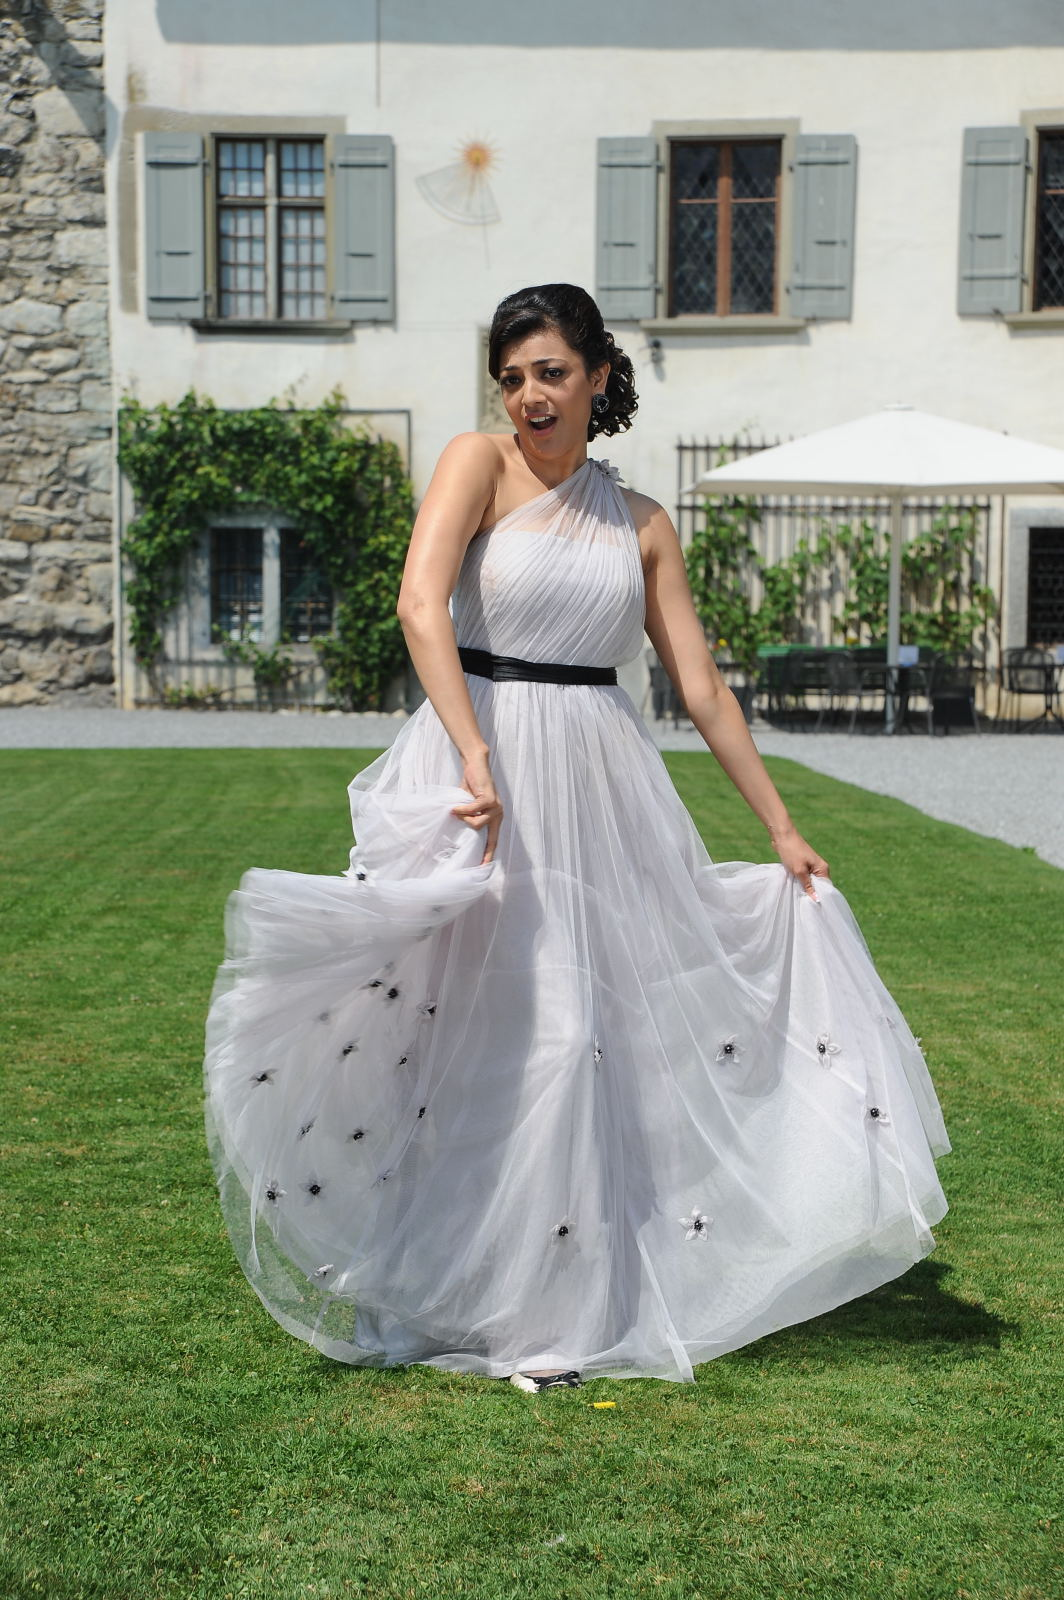 Glamorous Kajal Agarwal Photos In White Dress